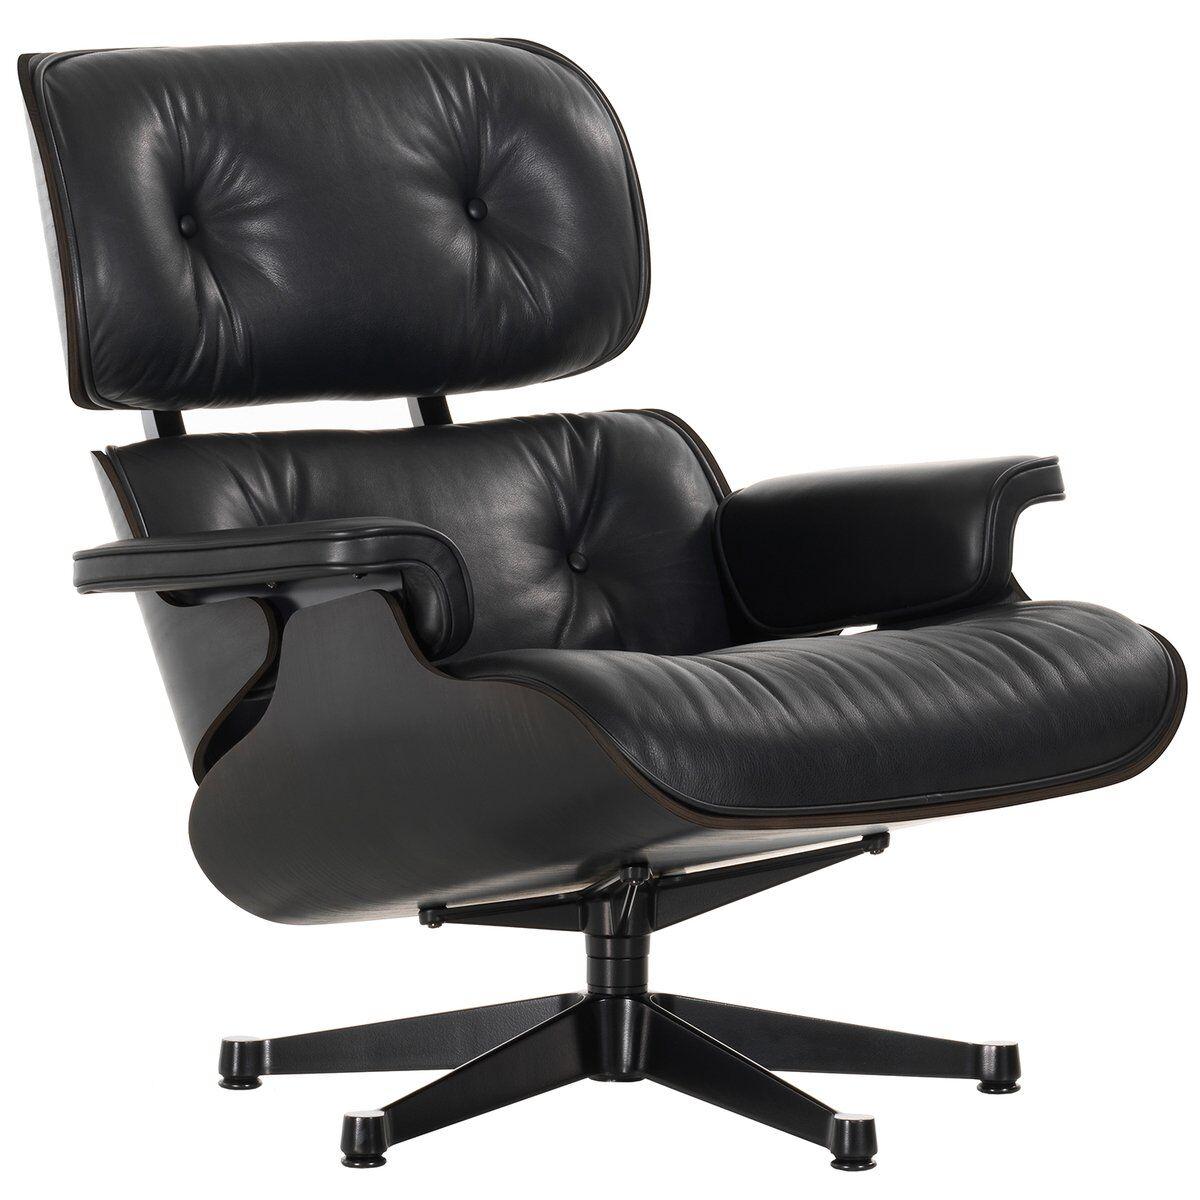 Vitra Eames Lounge Chair, classic koko, musta saarni - musta nahka